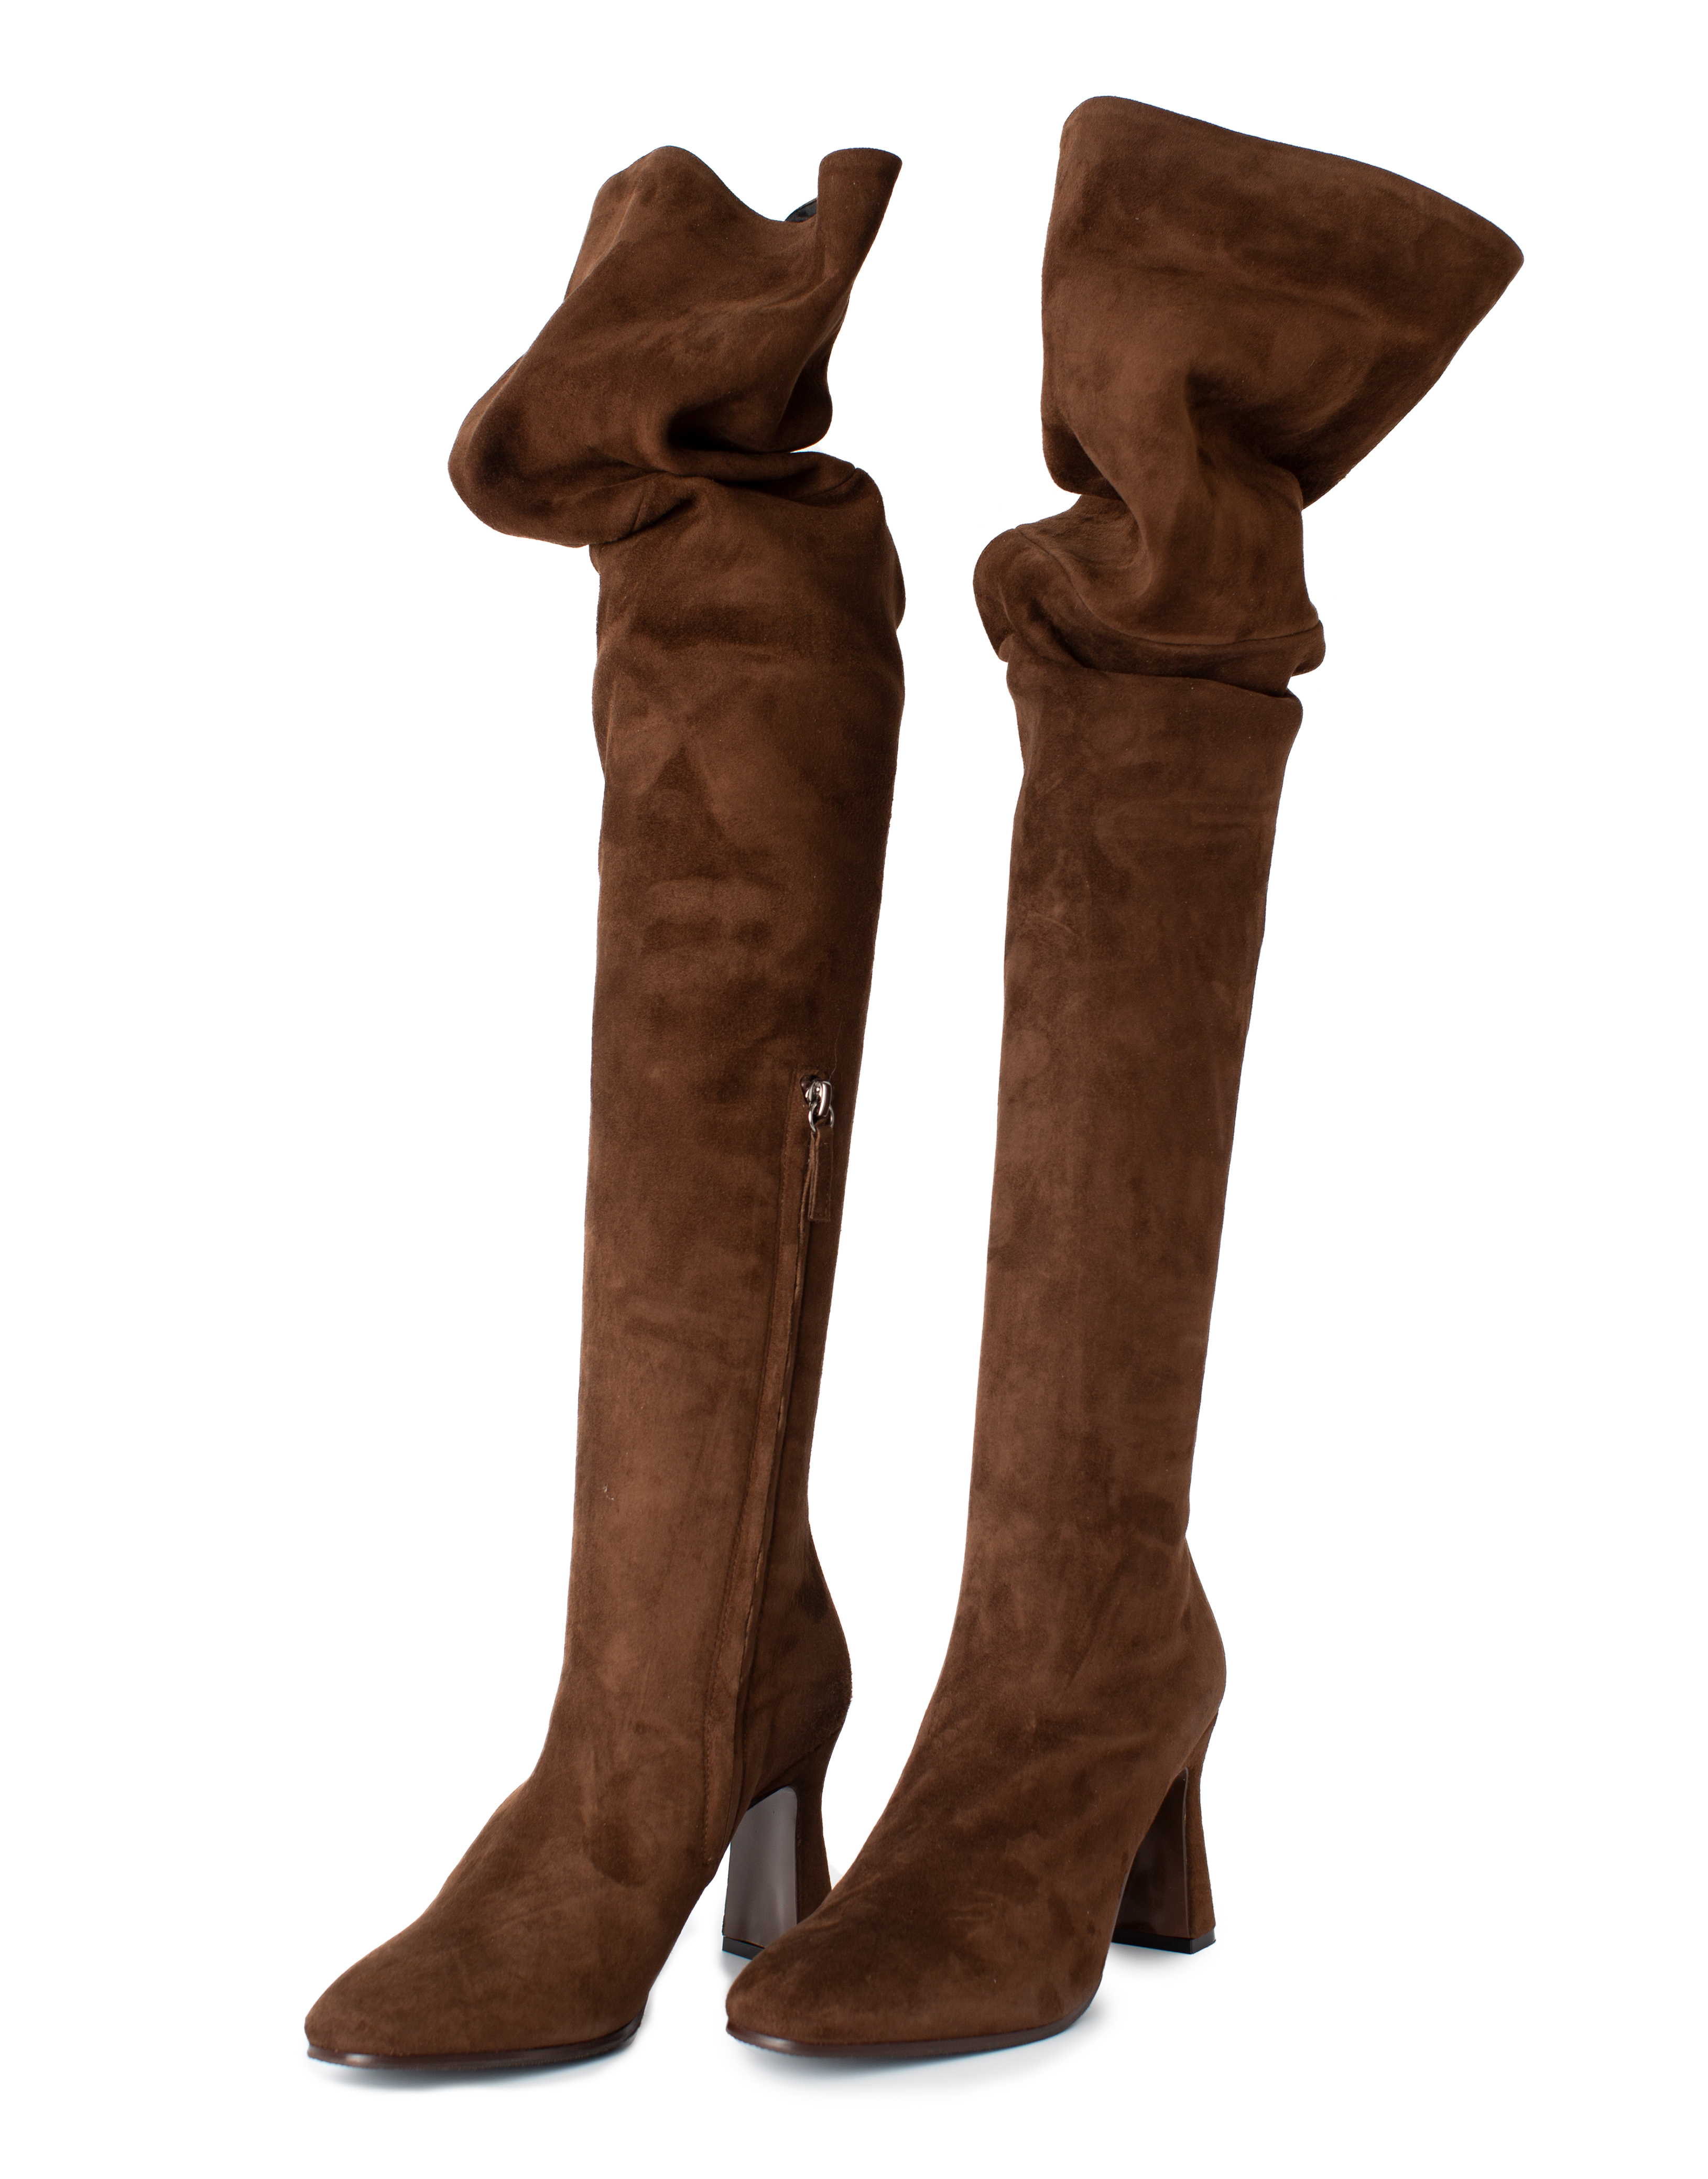 Overknee Boots Suede Leather, brown